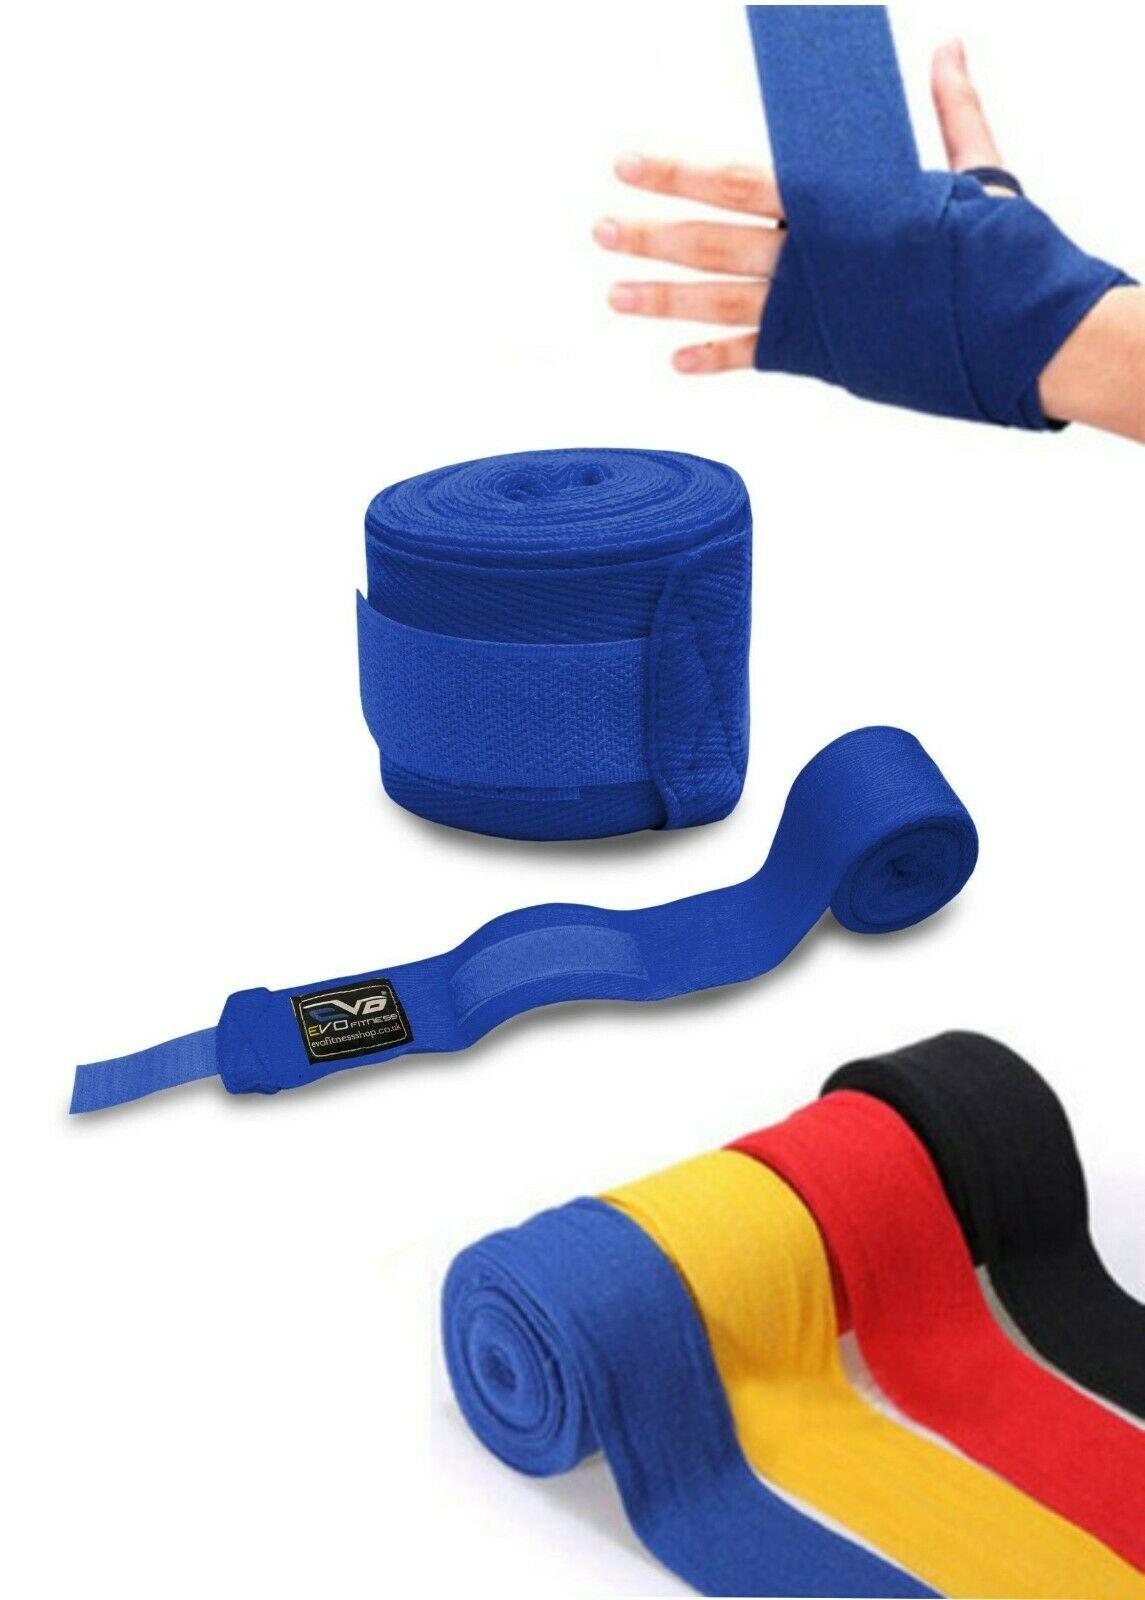 Boxing Hand Wraps bandages fitness karate